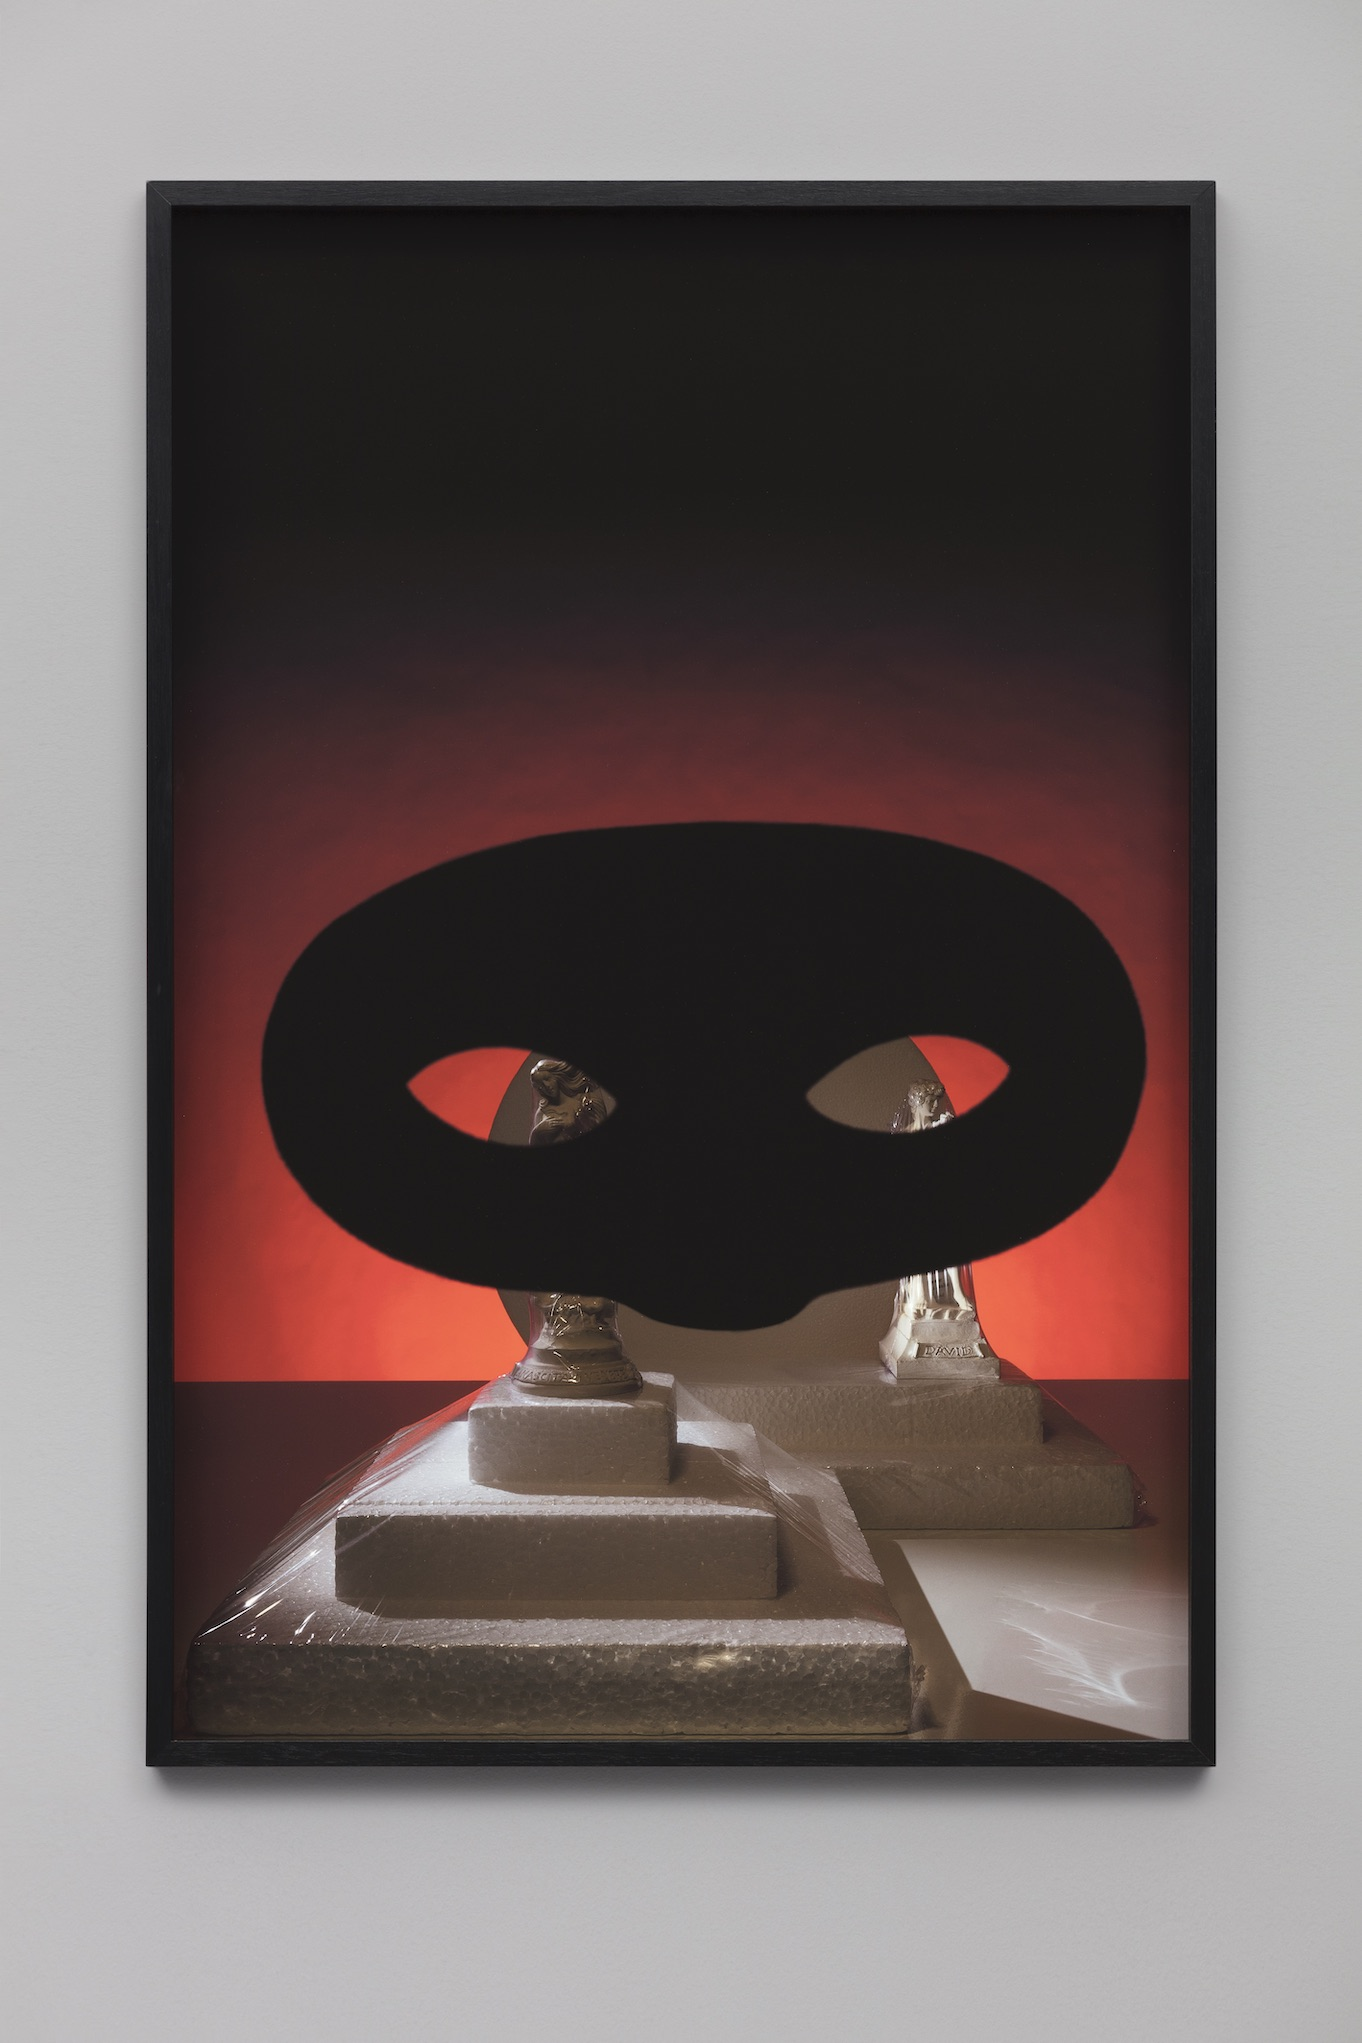 Anna Franceschini, CACCIA AL LADRO, 2020 digital print on cotton paper mounted on dibond, 120x80 cm